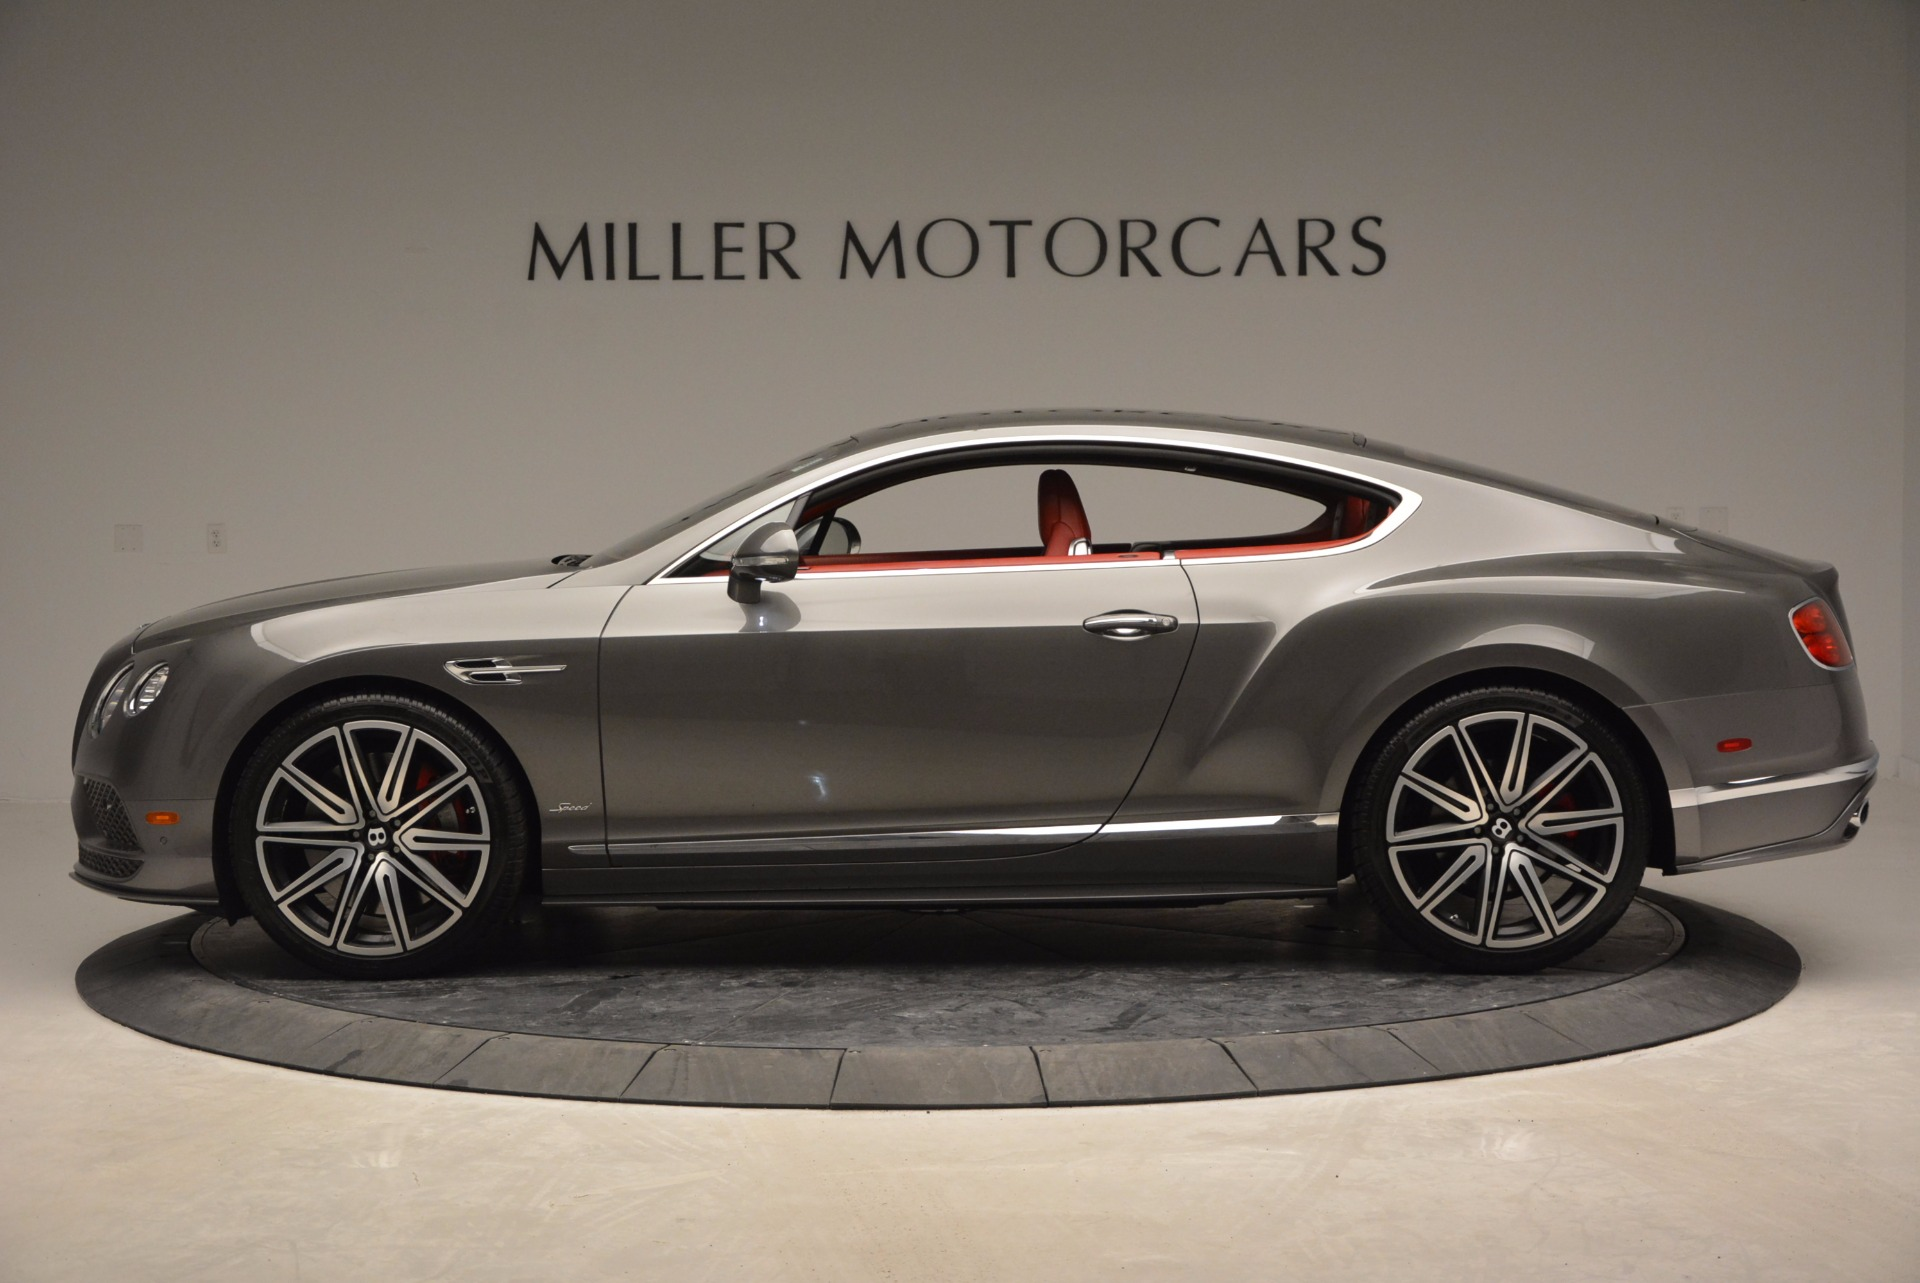 Used 2016 Bentley Continental GT Speed For Sale In Westport, CT 910_p3